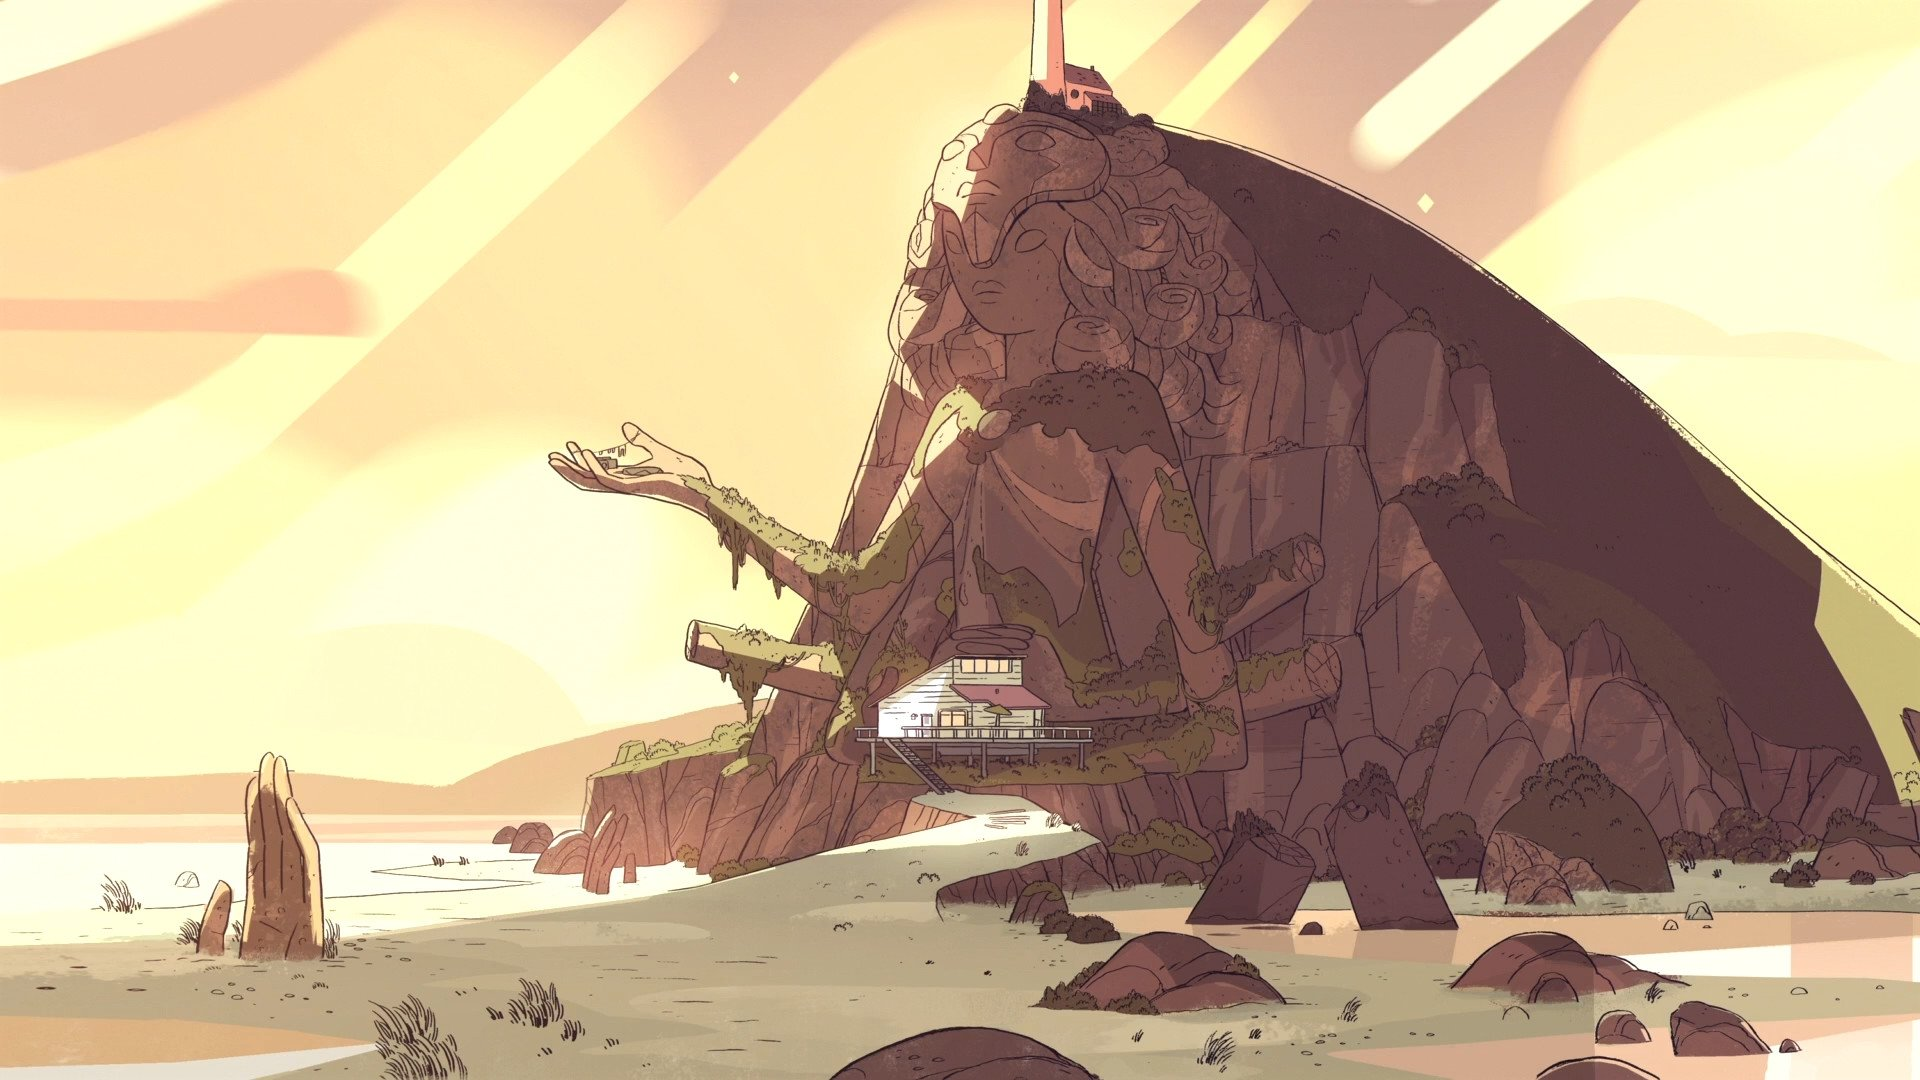 Steven Universe Wallpaper For Pc